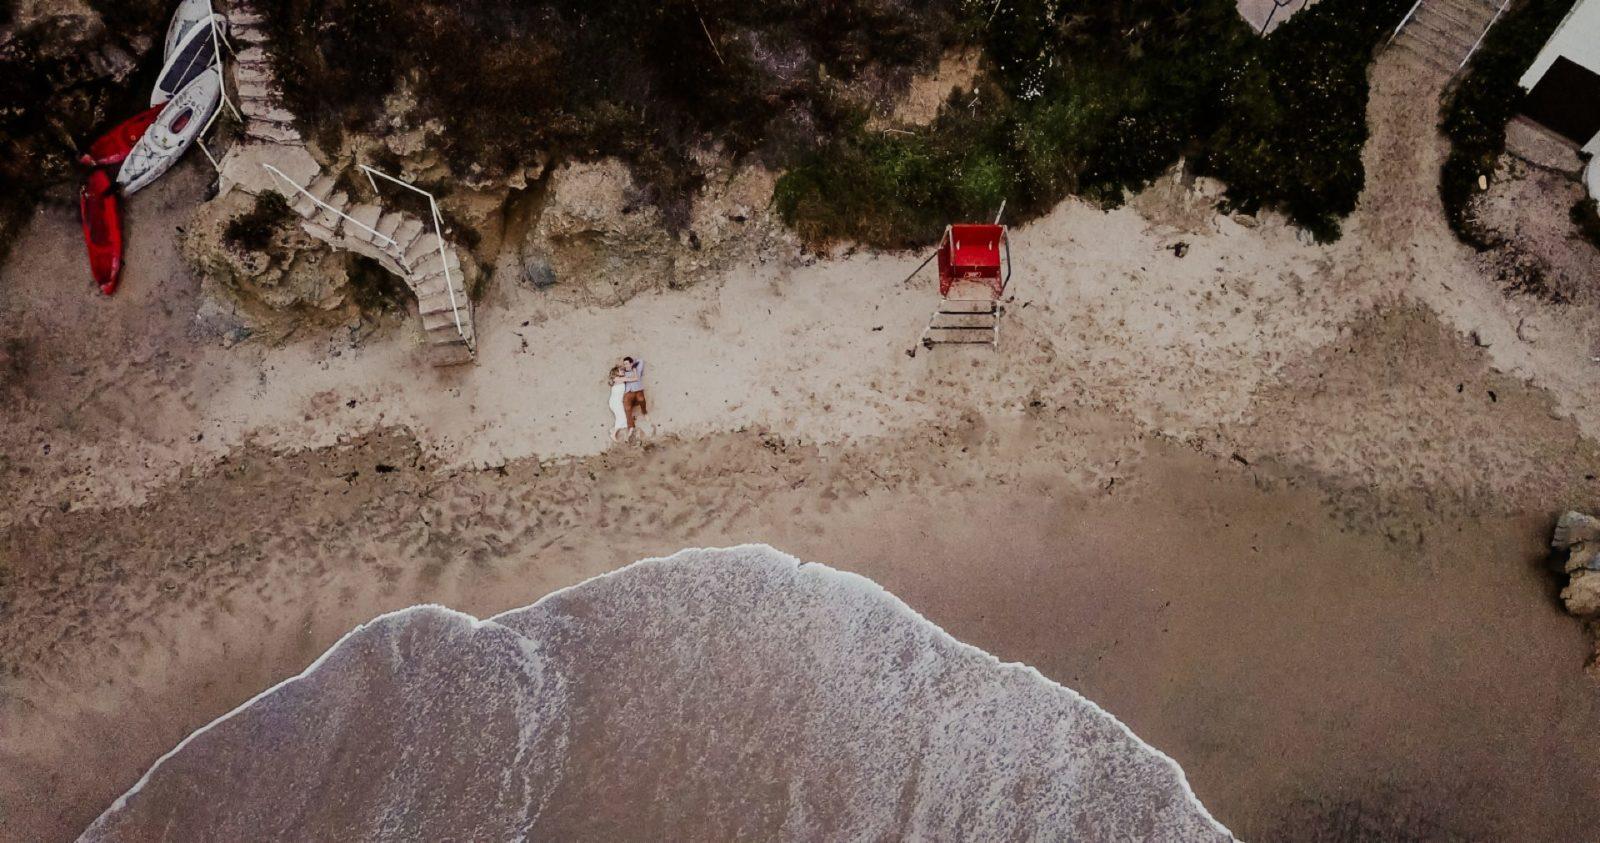 laguna-beach-engagement-photos_032-1600x843.jpg